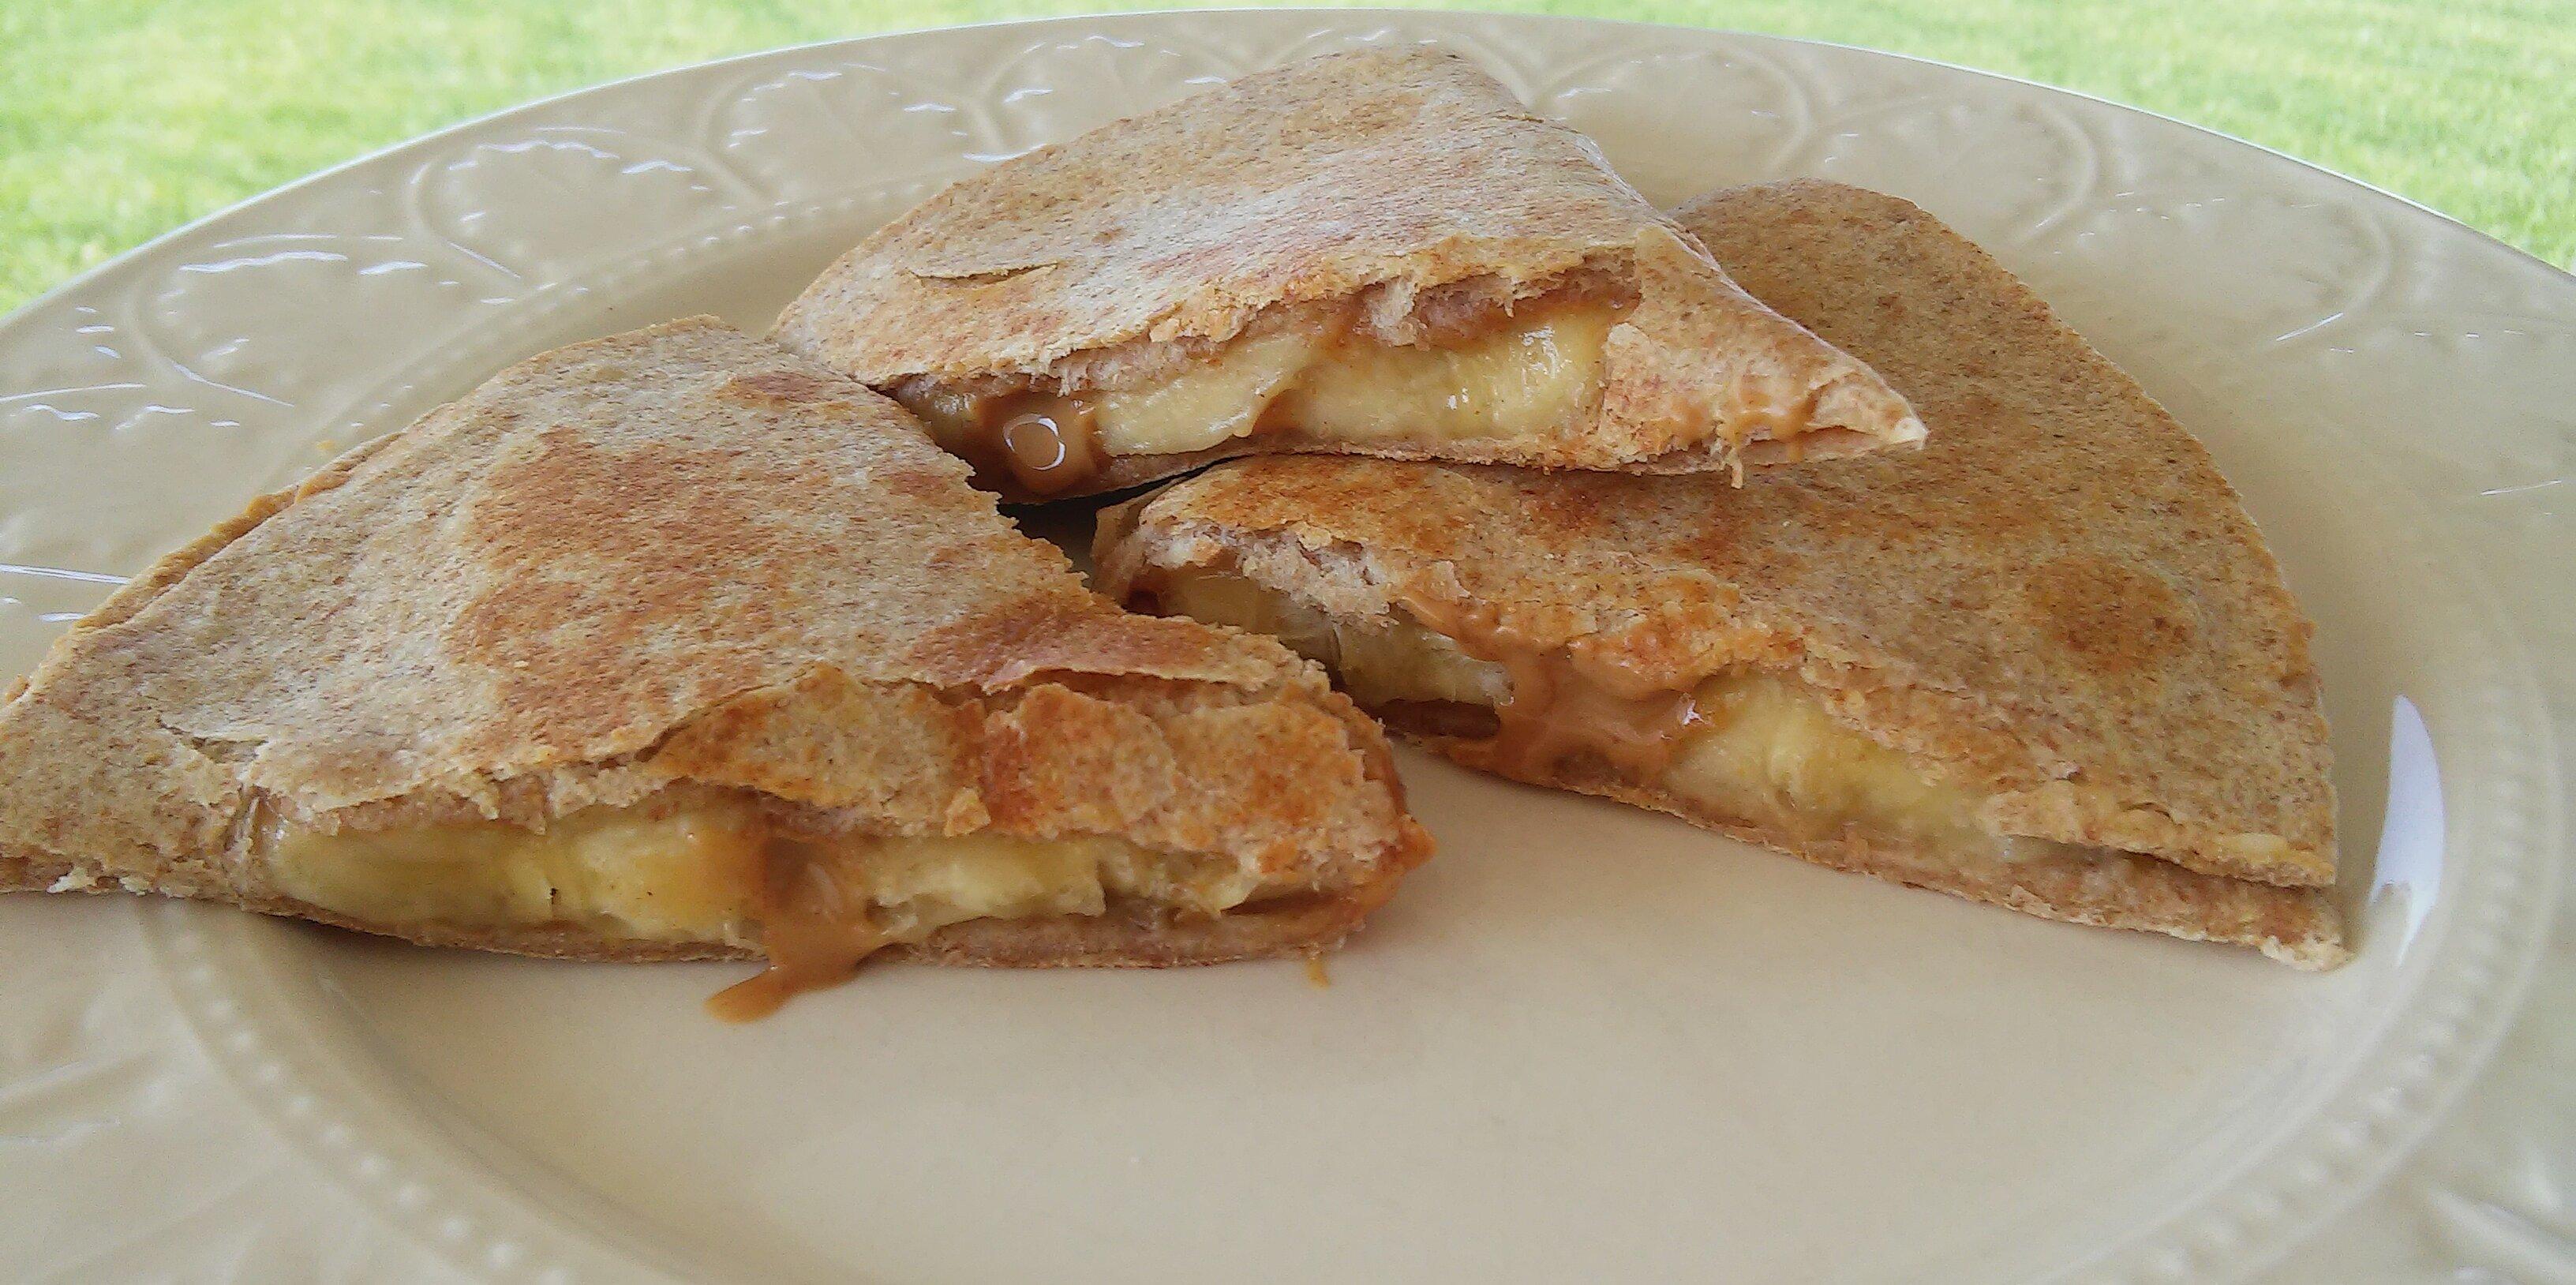 peanut butter banana quesadilla recipe